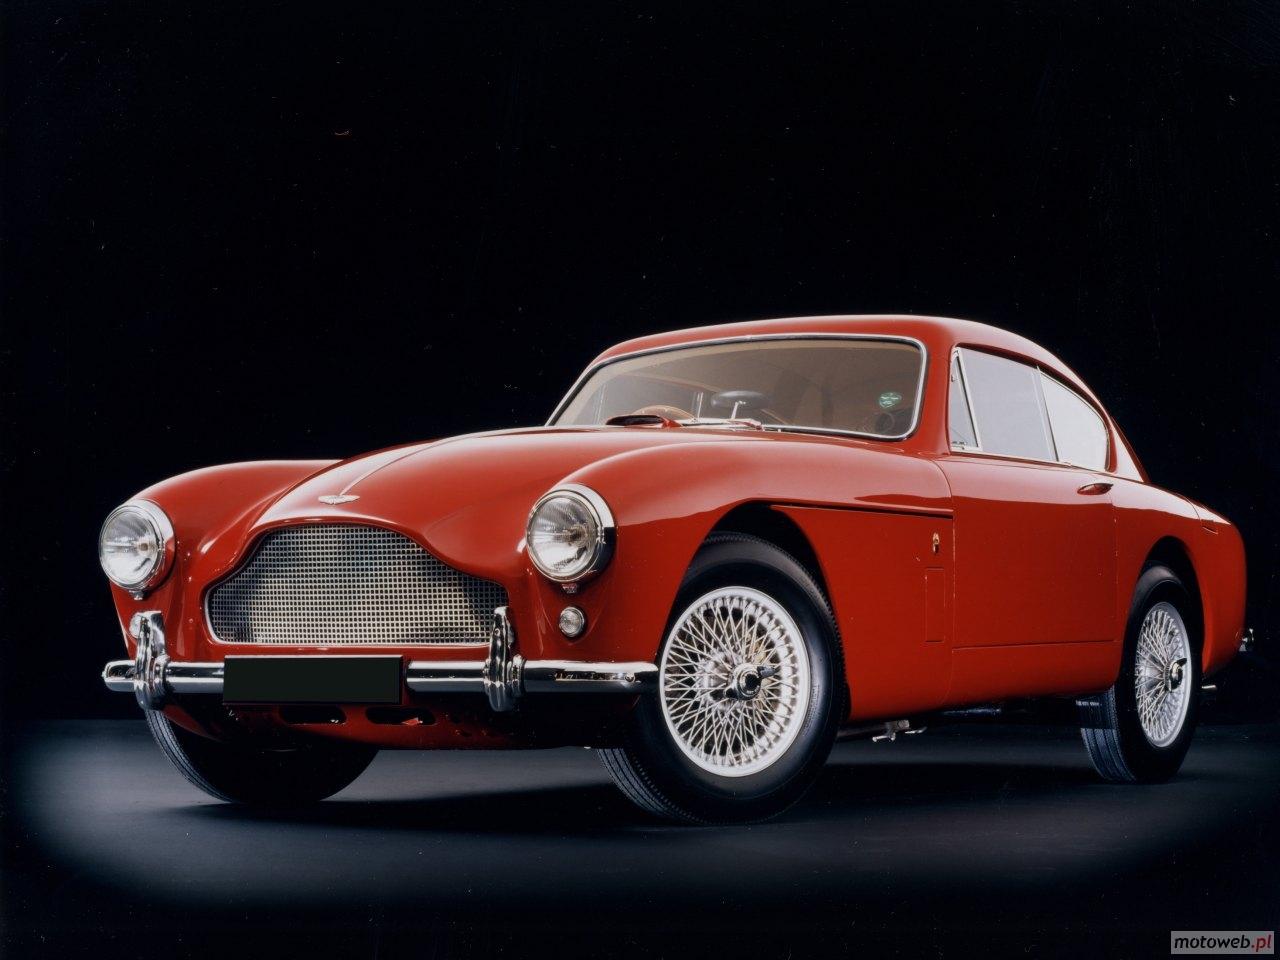 Aston Martin DB3 (road car)